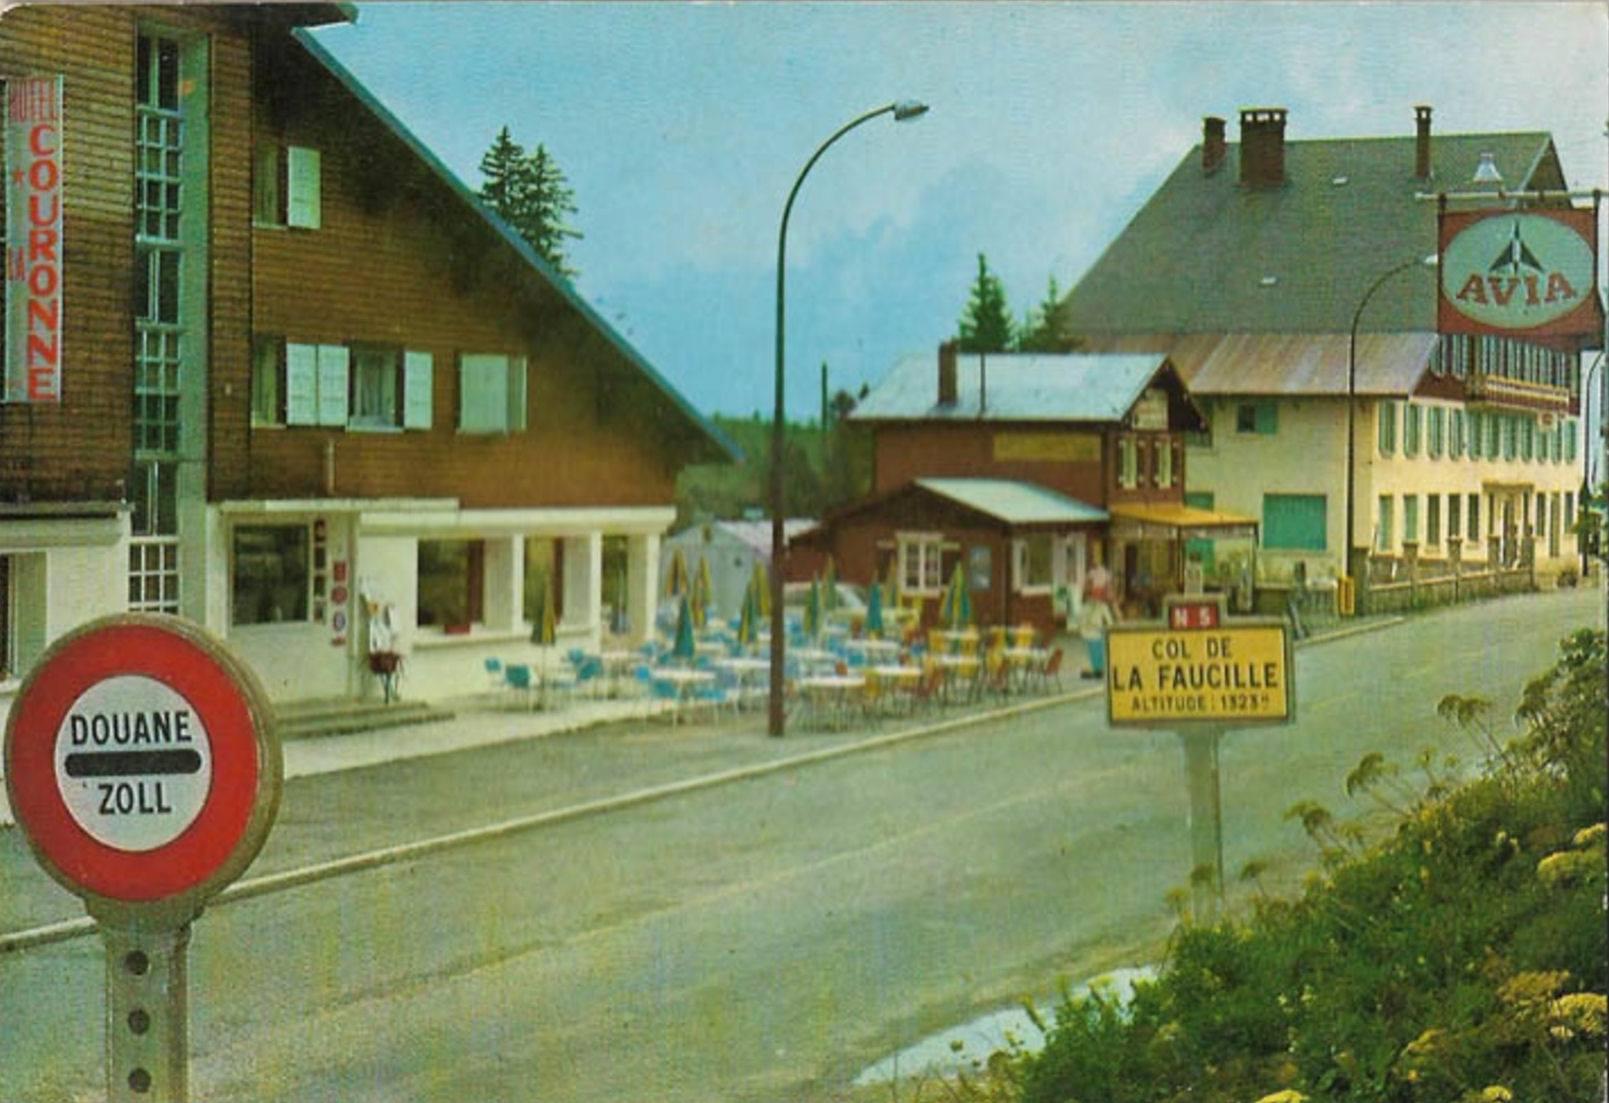 Grens-La-Faucille